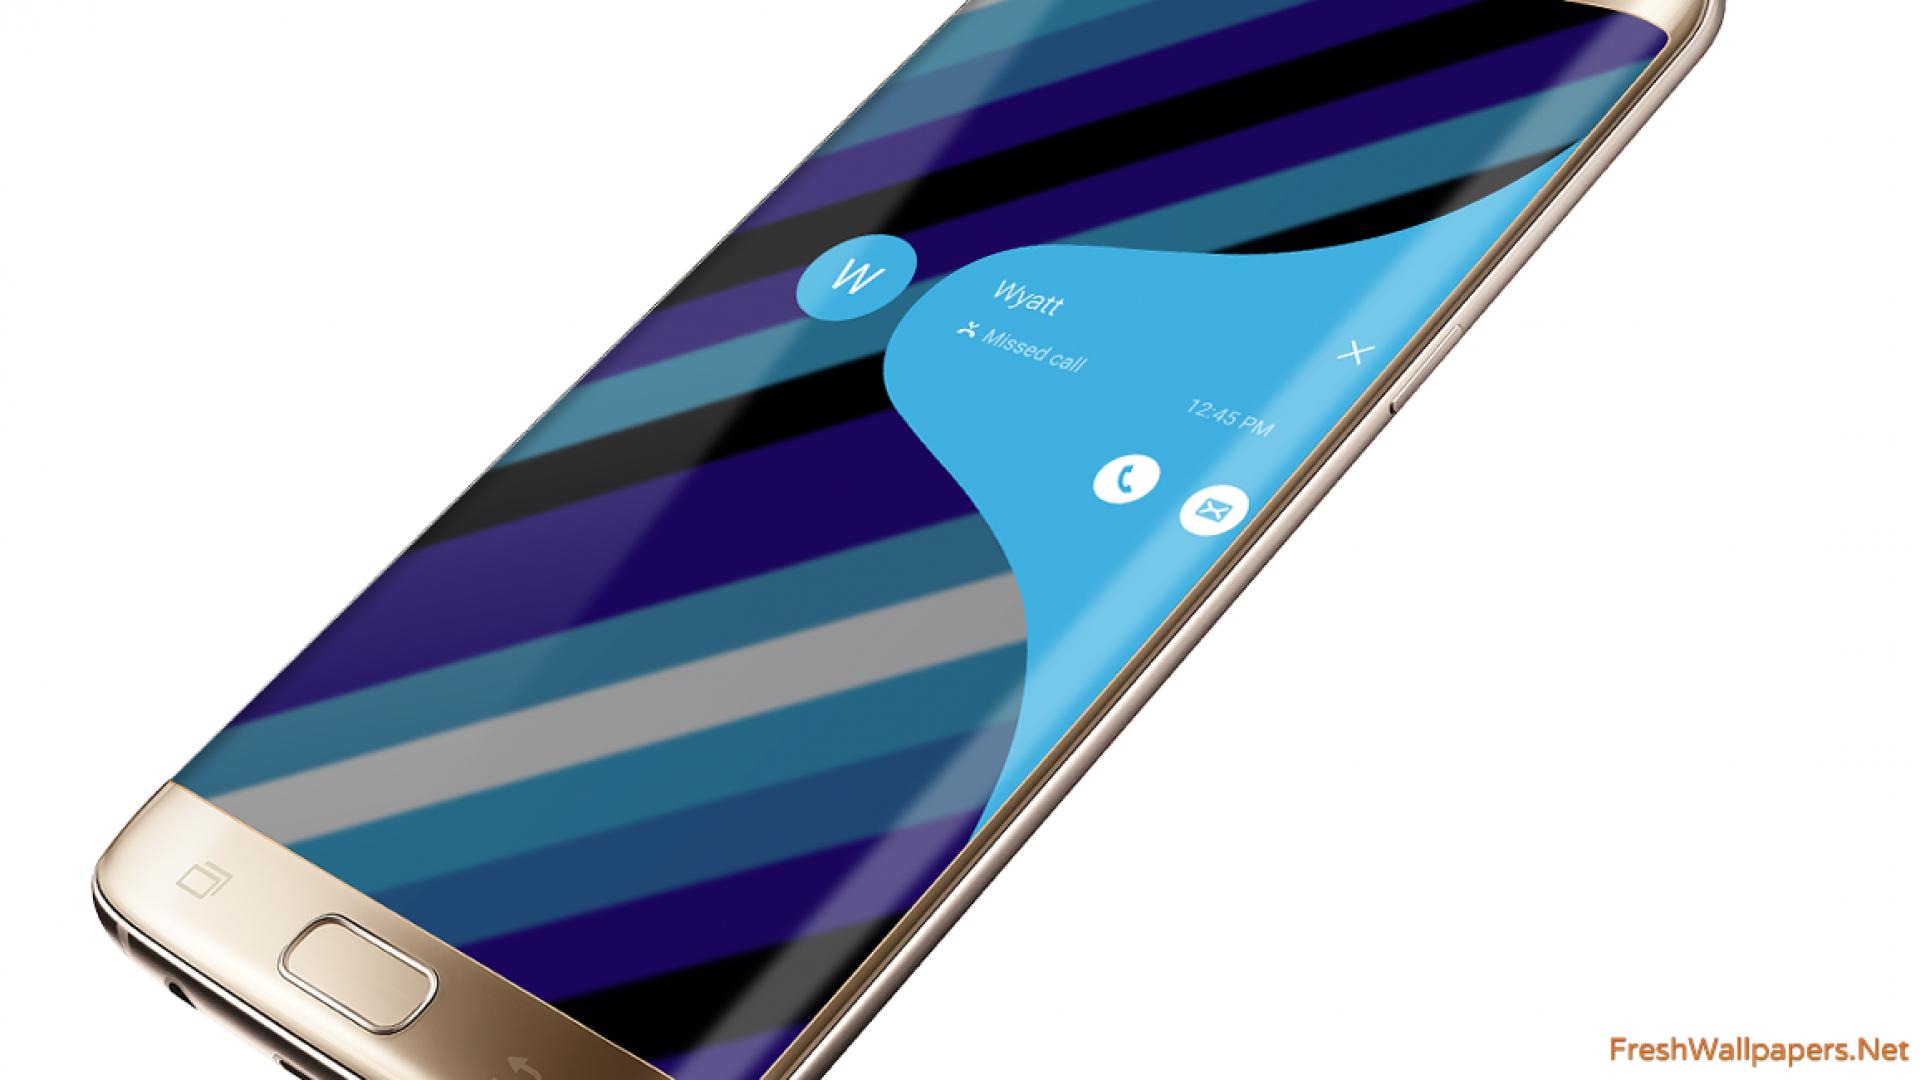 Samsung Galaxy S7 Edge Wallpaper Samsung A 7 Edge 289877 Hd Wallpaper Backgrounds Download